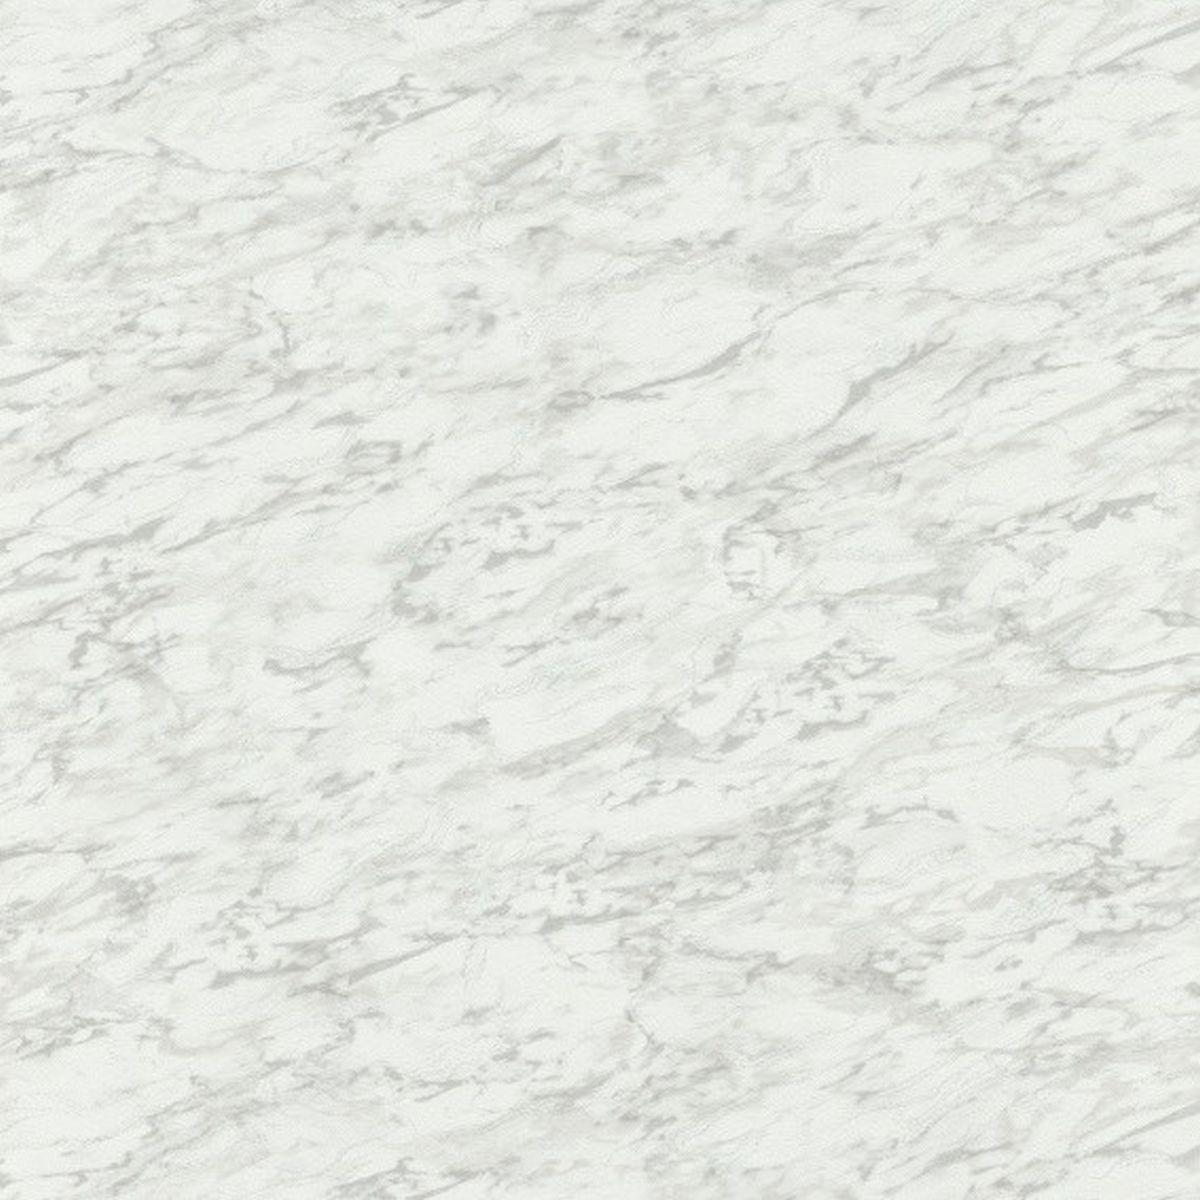 Erismann Vlies-Tapete Kollektion 'Instawalls' 639210 Stein & Betonoptik